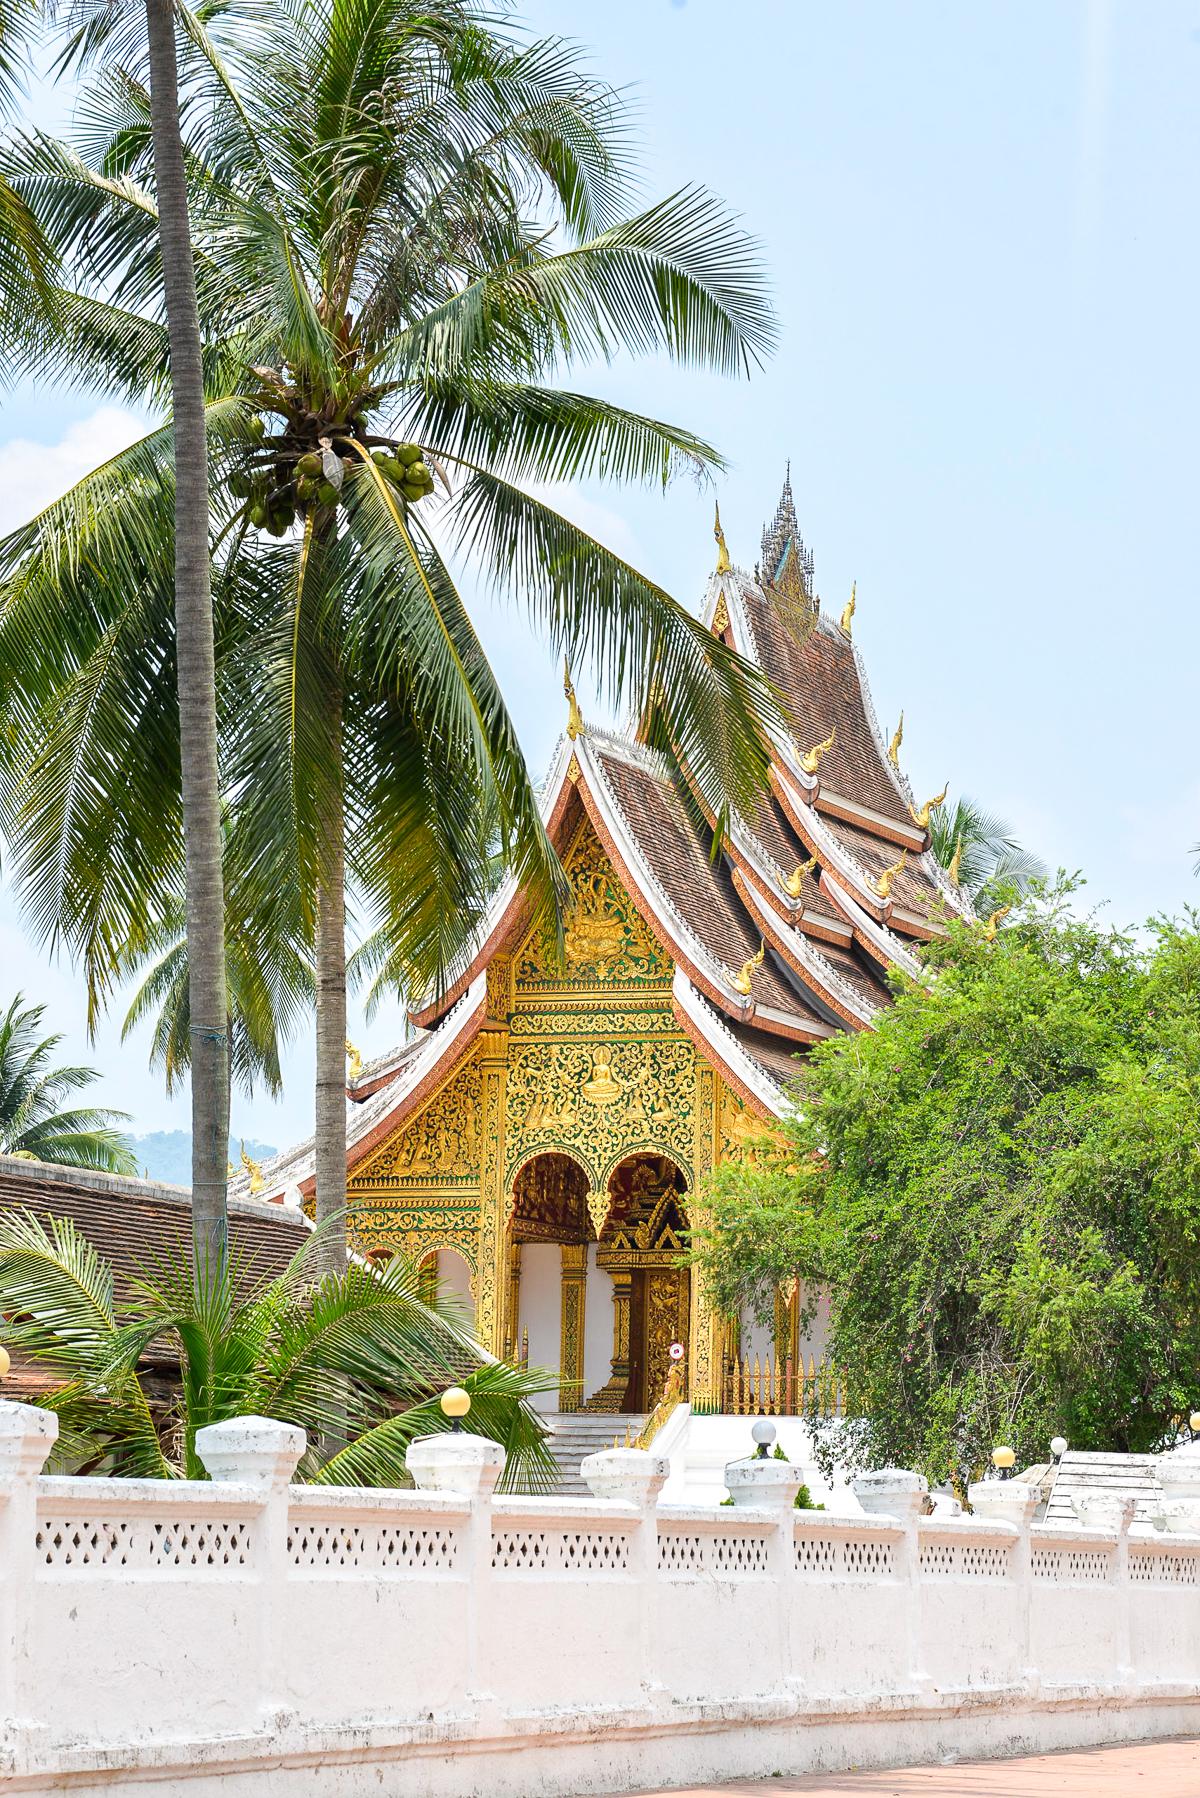 Stacie Flinner 3 Nagas Complete Guide to Luang Prabang-116.jpg